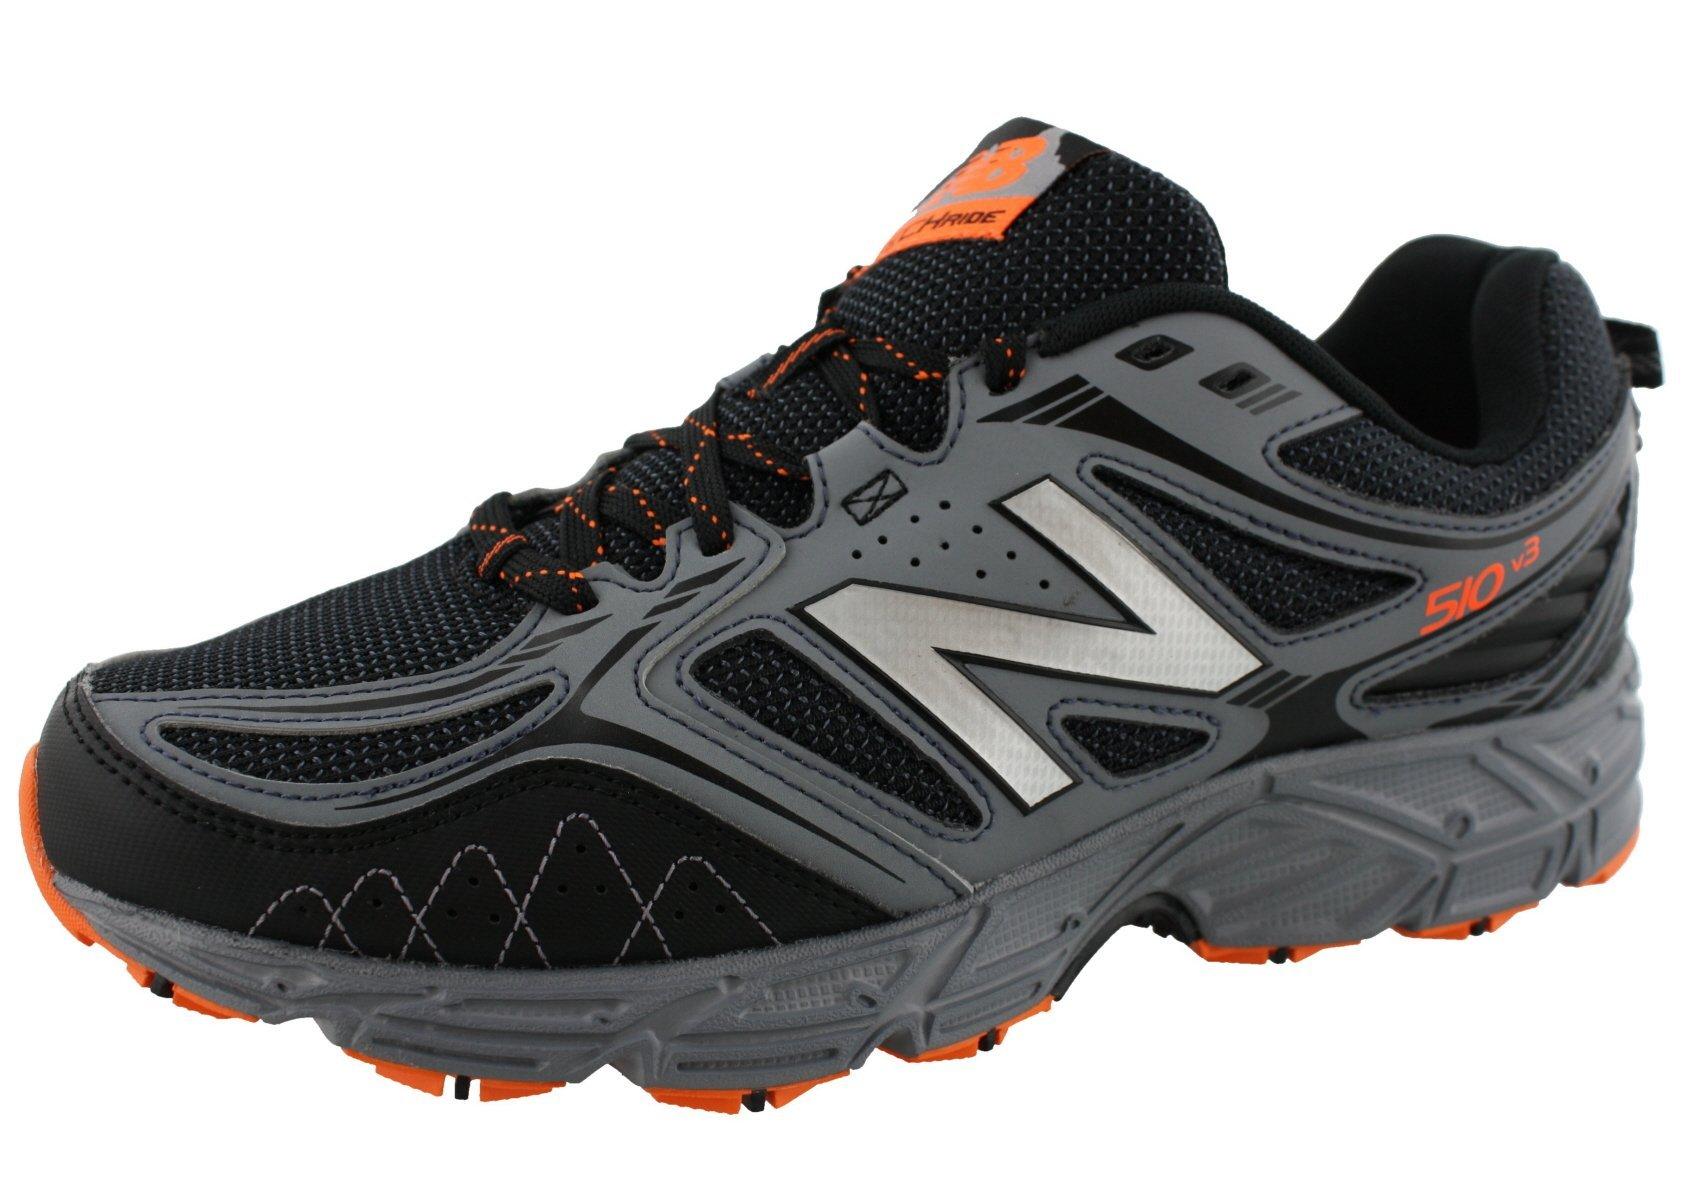 New Balance Men's 510v3 Trail Running Shoe, Black/Grey, 11 4E US